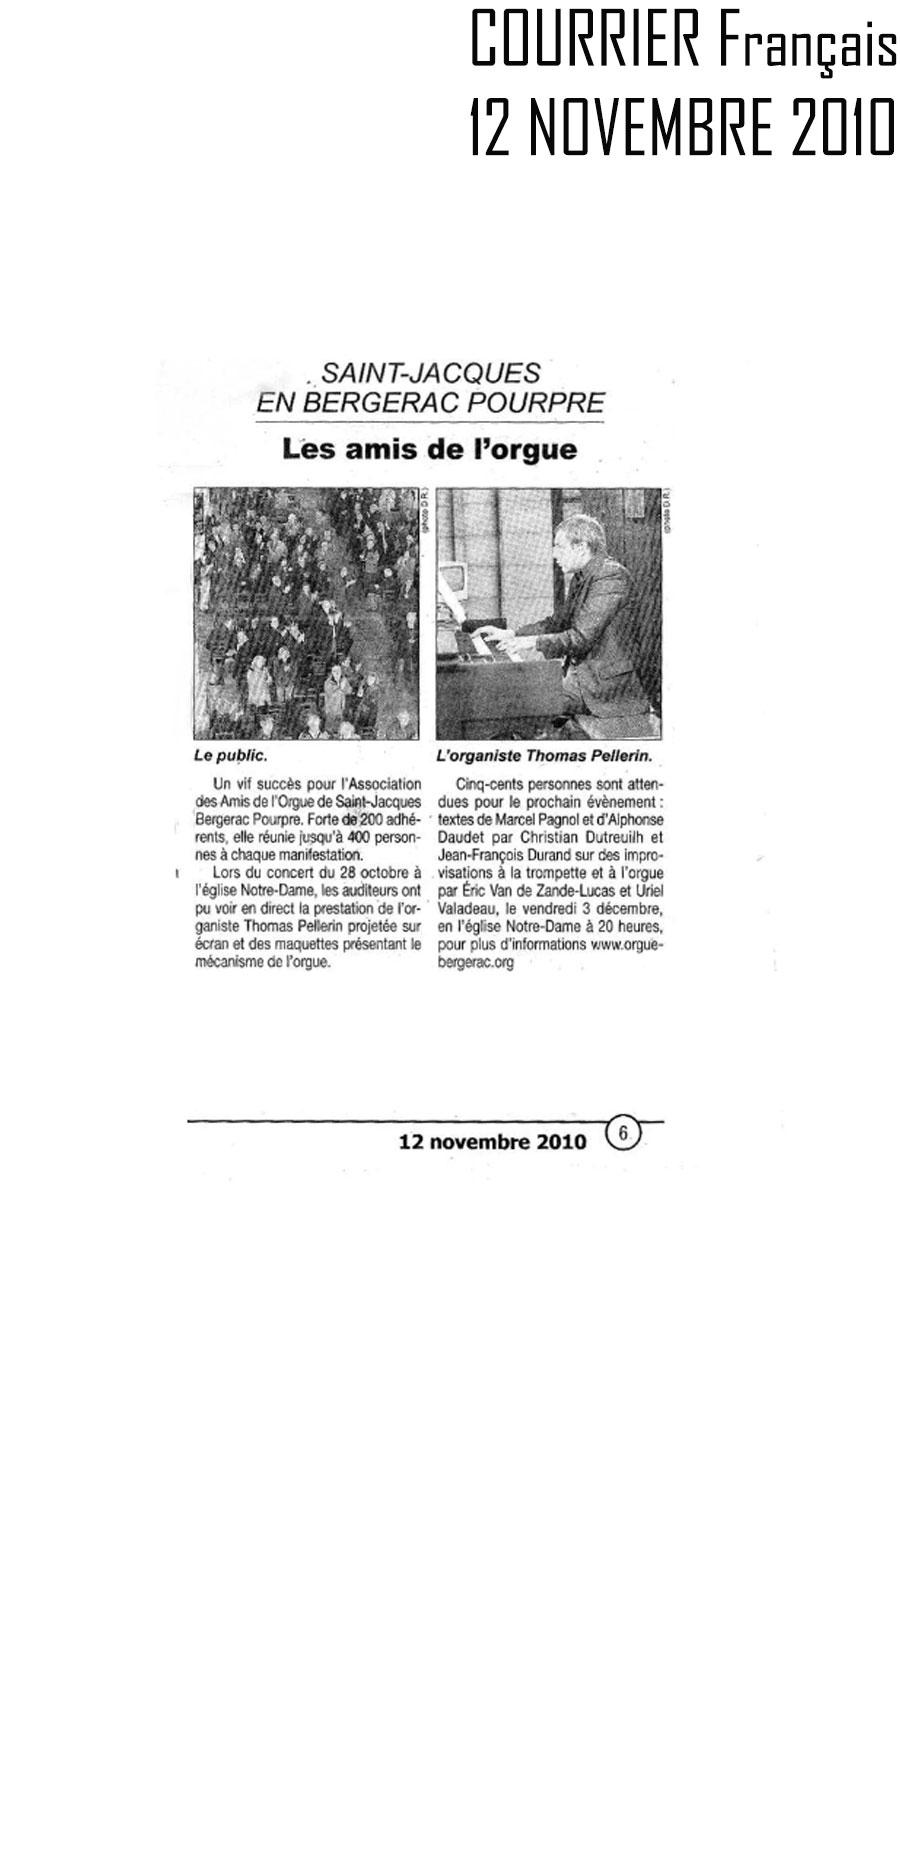 courrier-fran-12112010